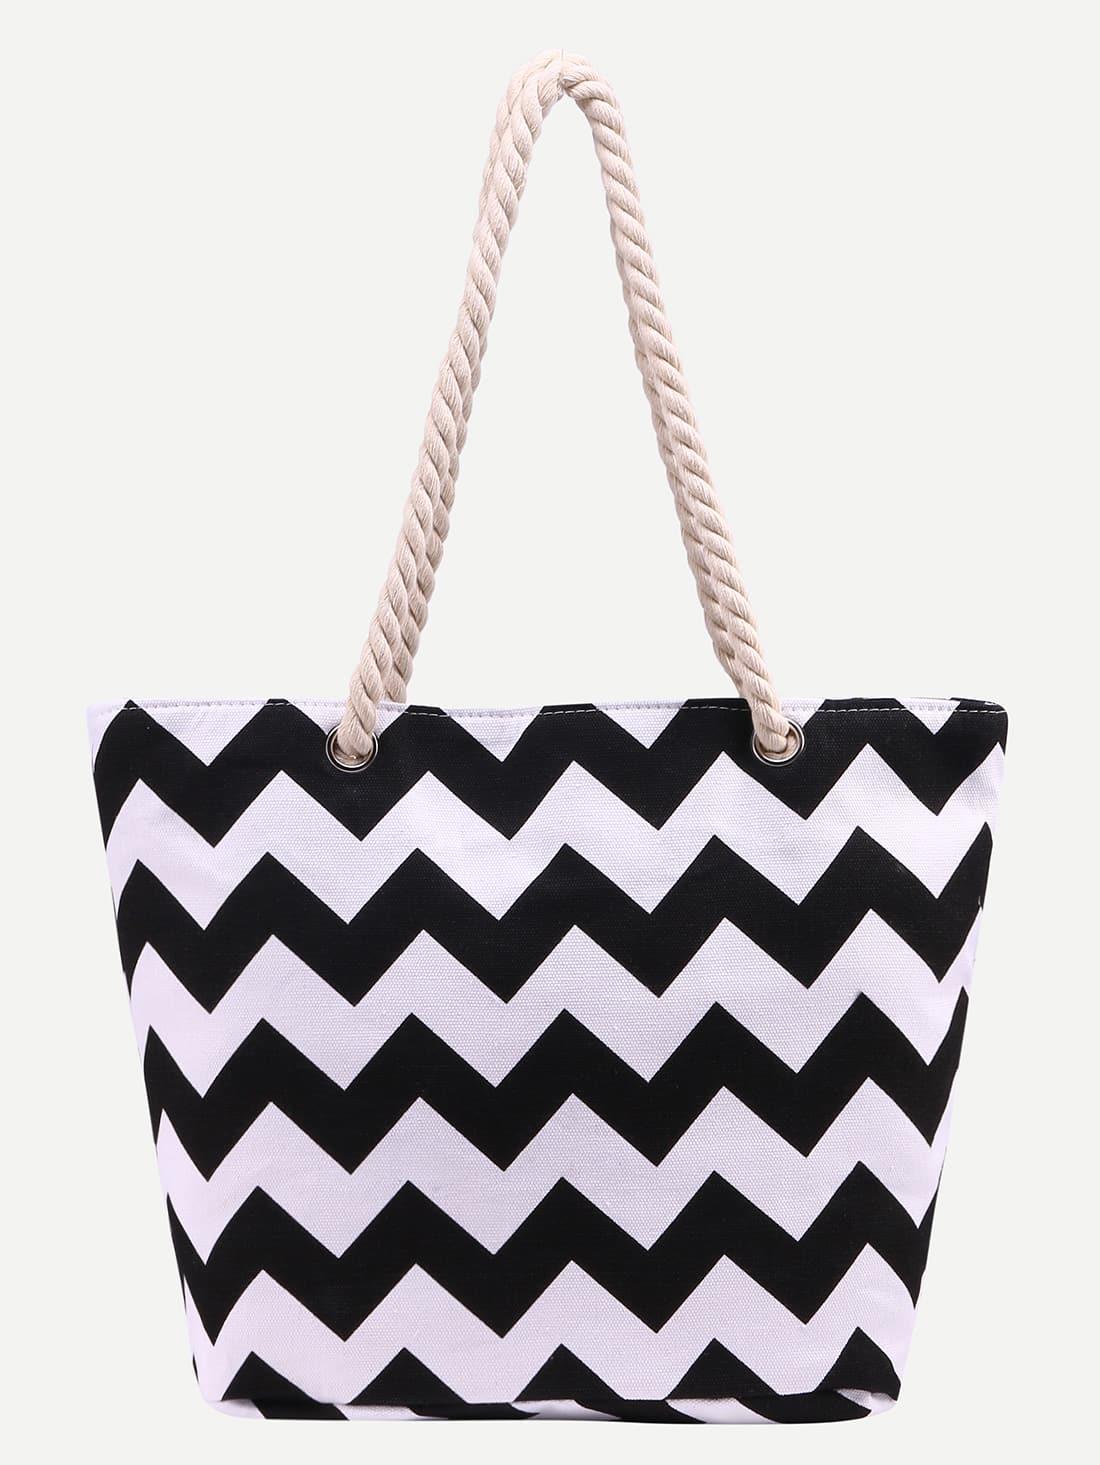 Contrast Chevron Print Canvas Shopper Bag bag160615309